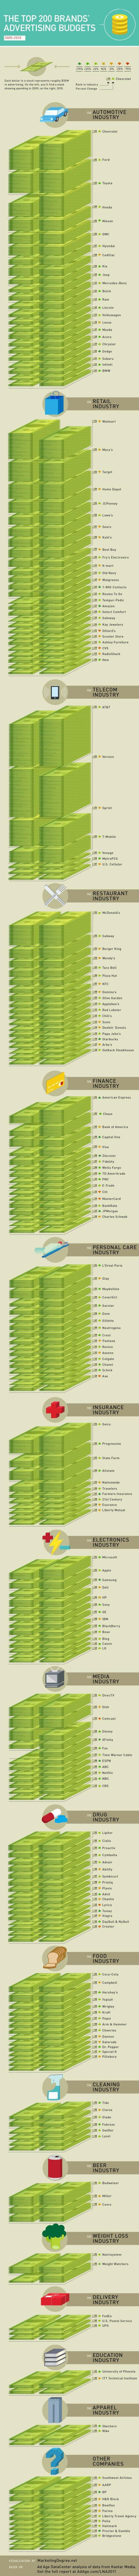 L'advertising budget dei top 200 inserzionisti [INFOGRAFICA]